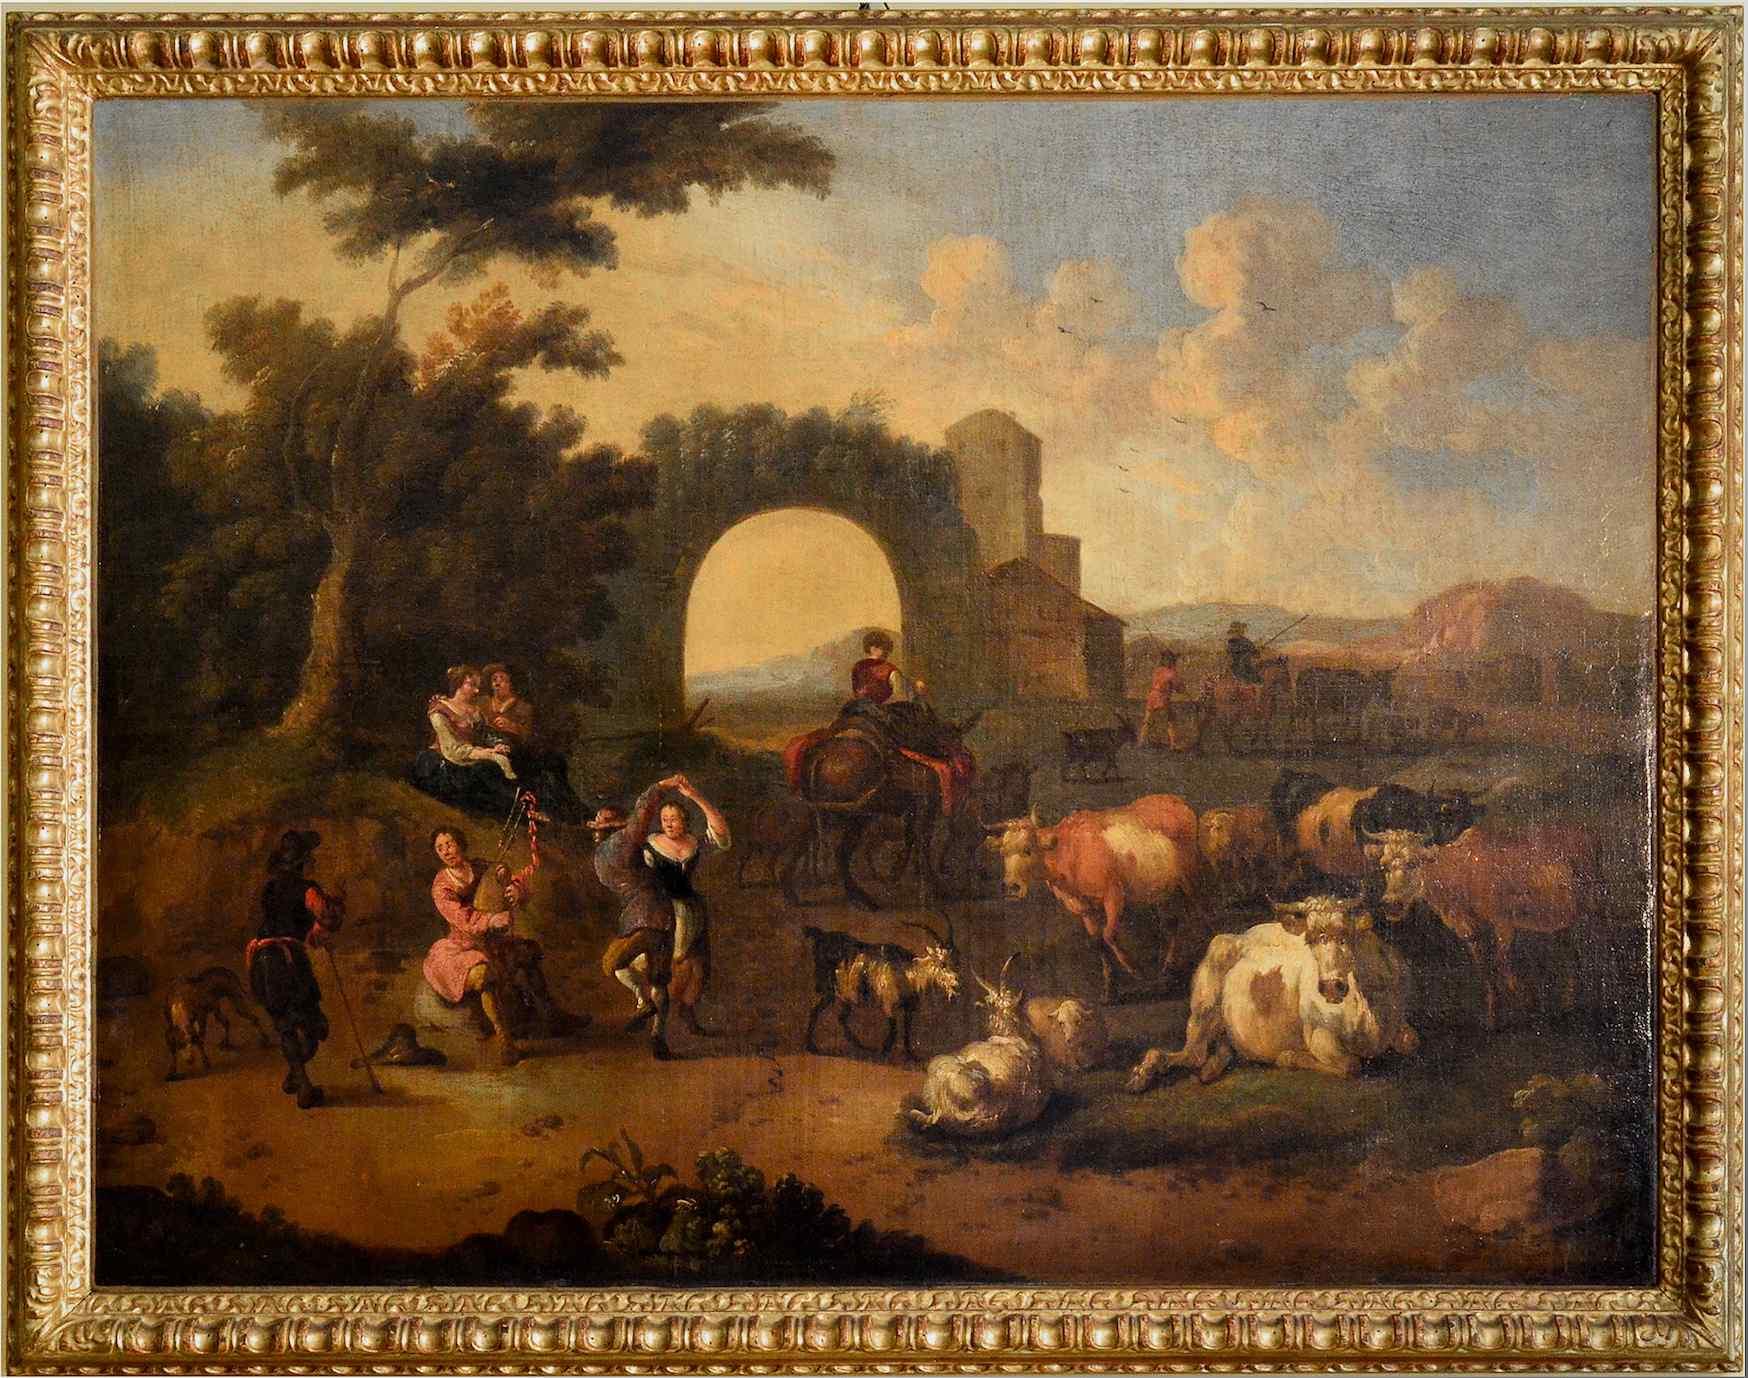 Michelangelo Cerquozzi (1602 - 1660) atelier, festival rural